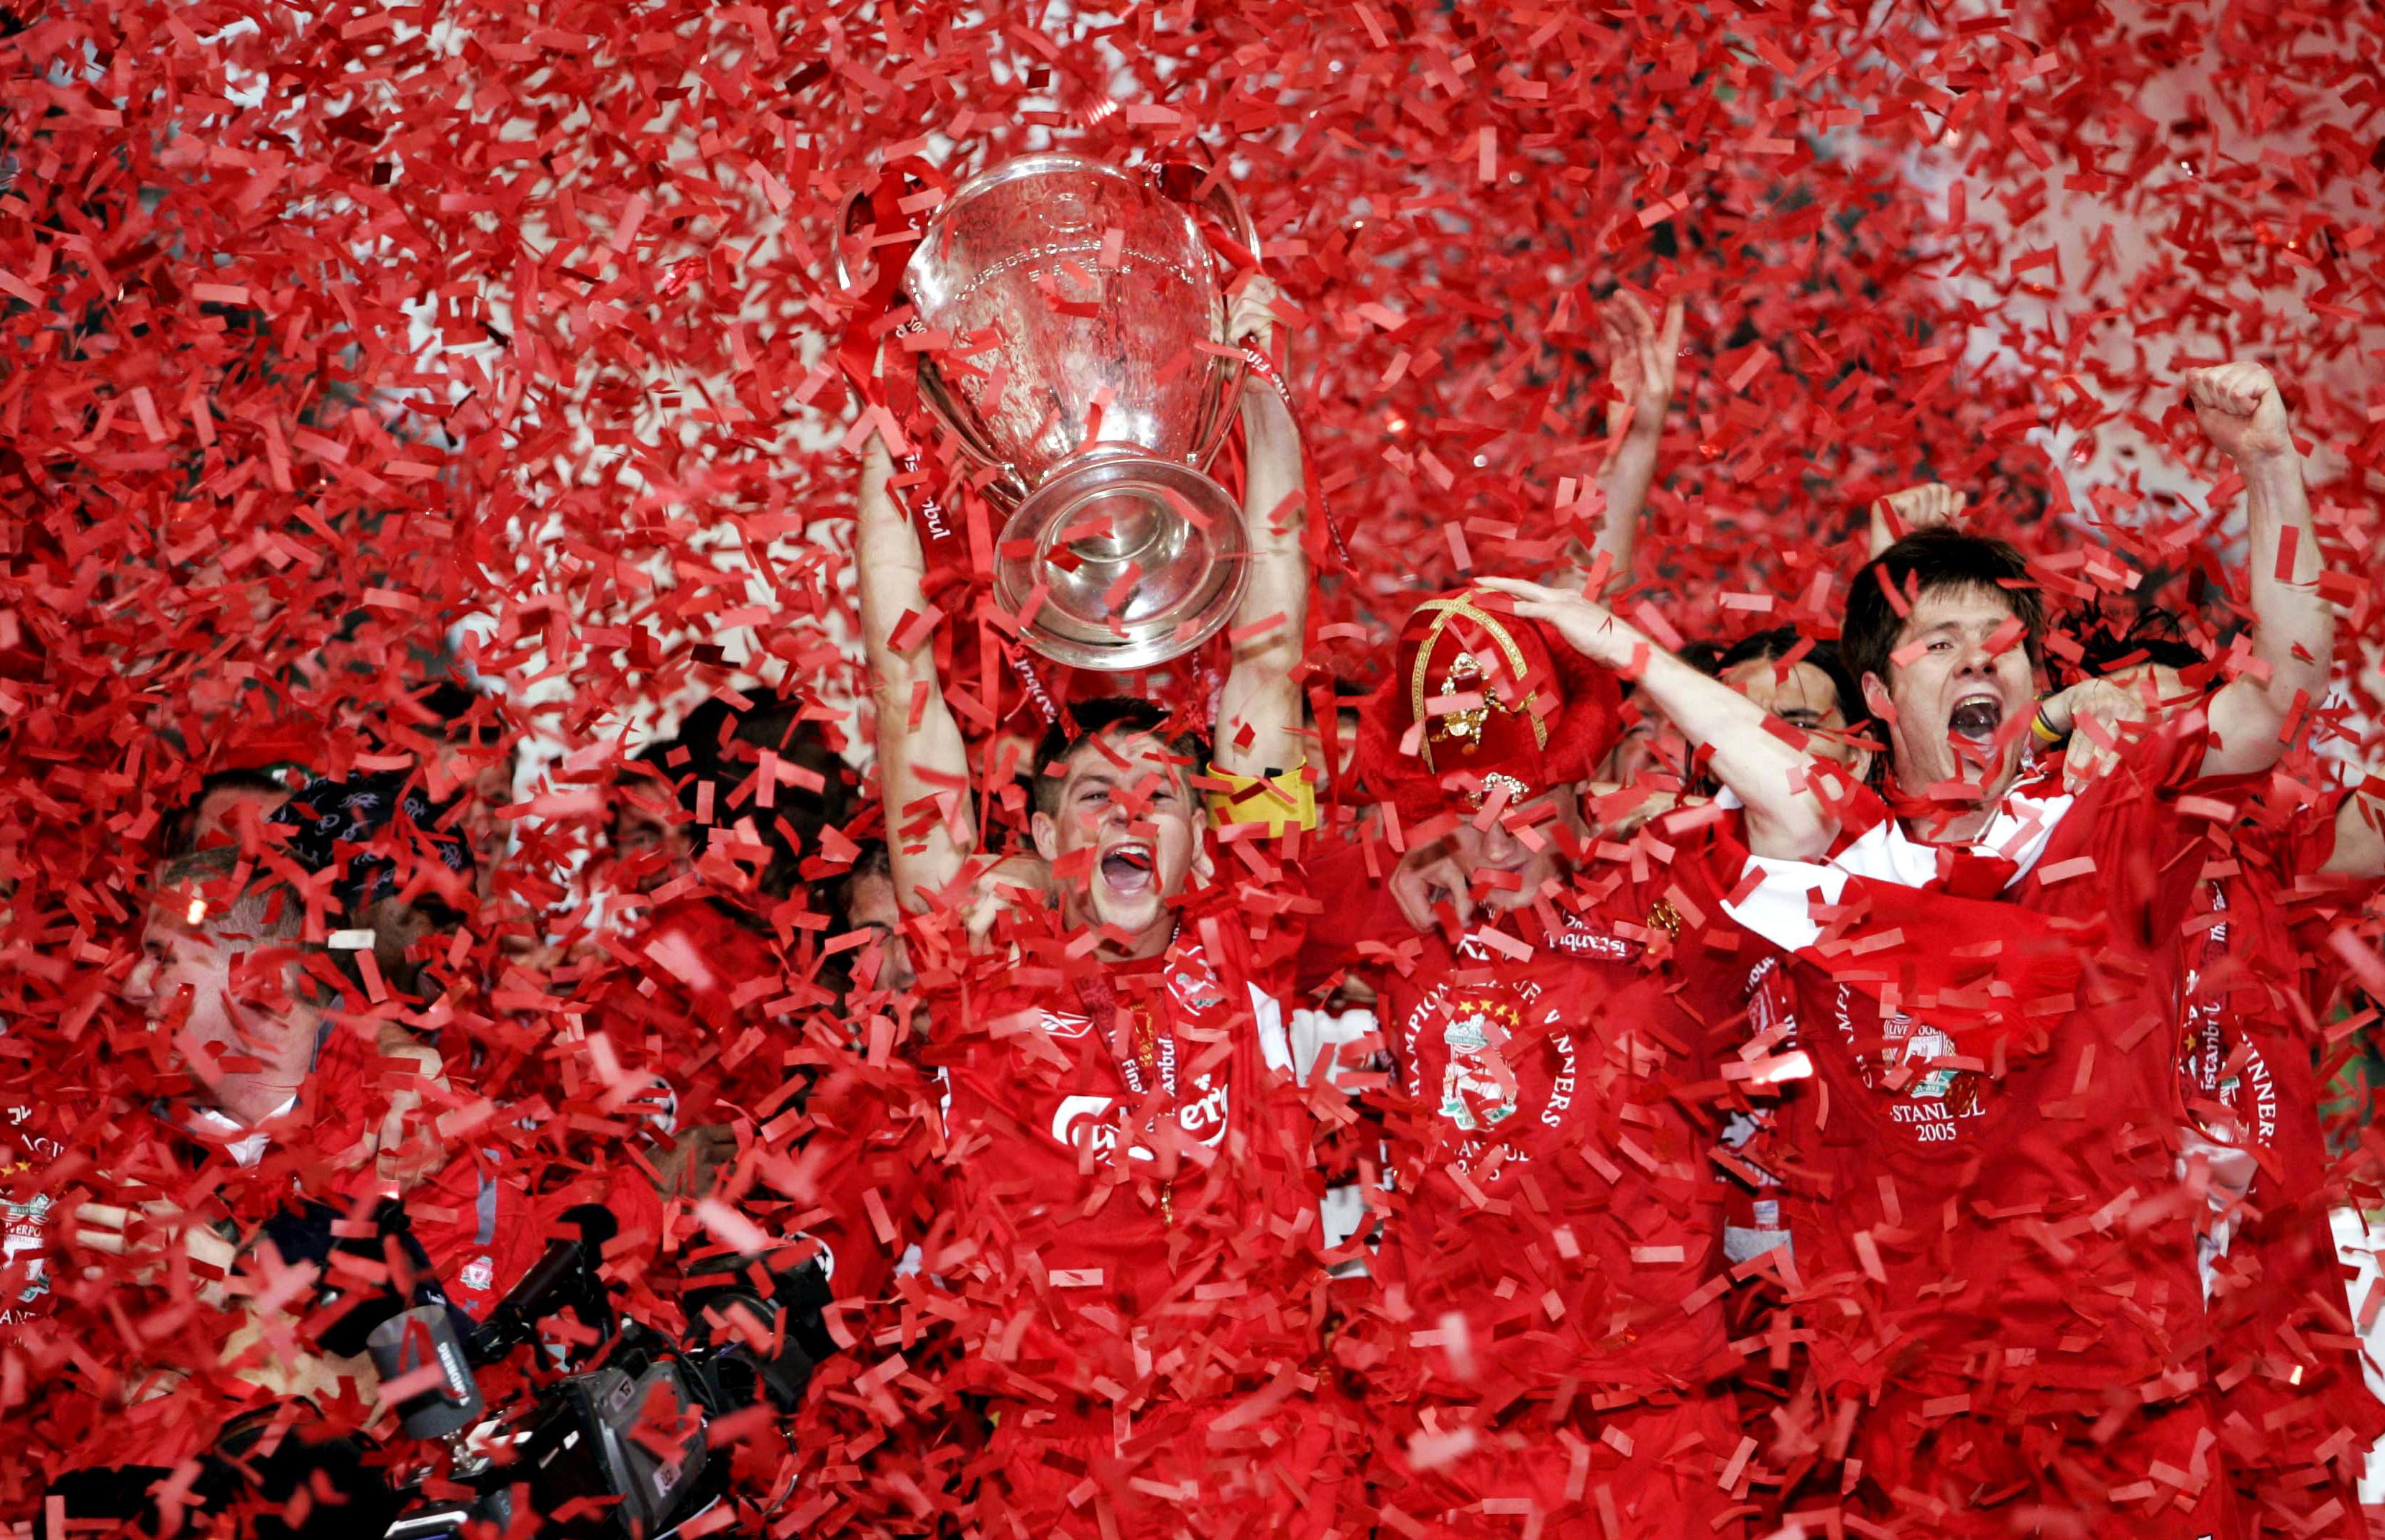 Liverpool: Most Champions League appearances